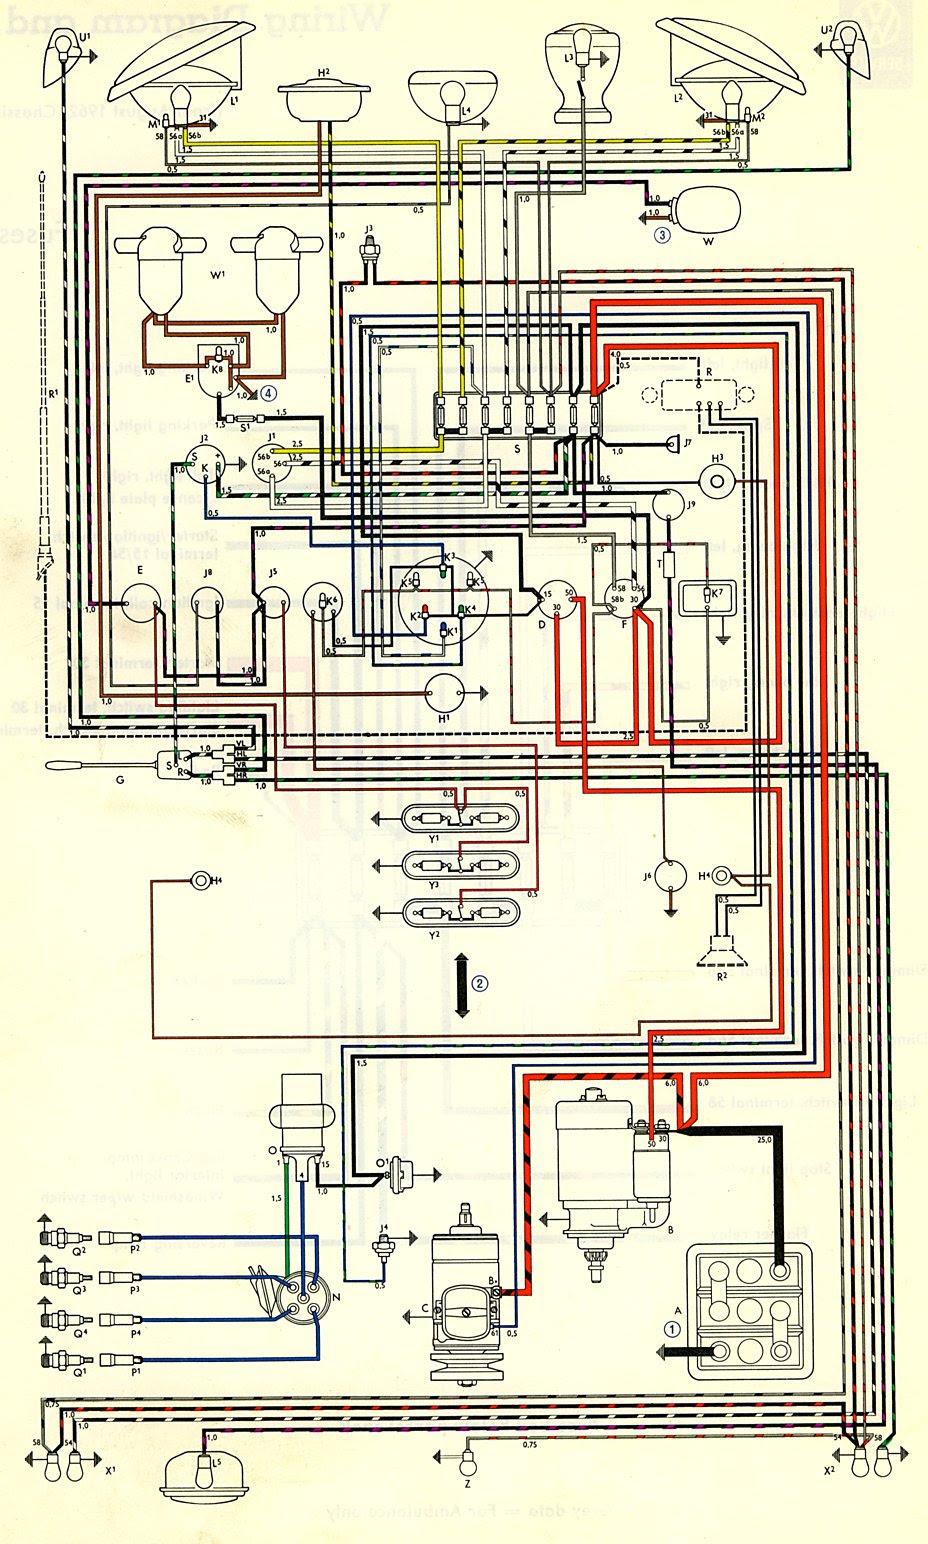 Wiring 1991 Southwind Motorhome Electrical Diagram Hd Quality Kneediagram Kinggo Fr